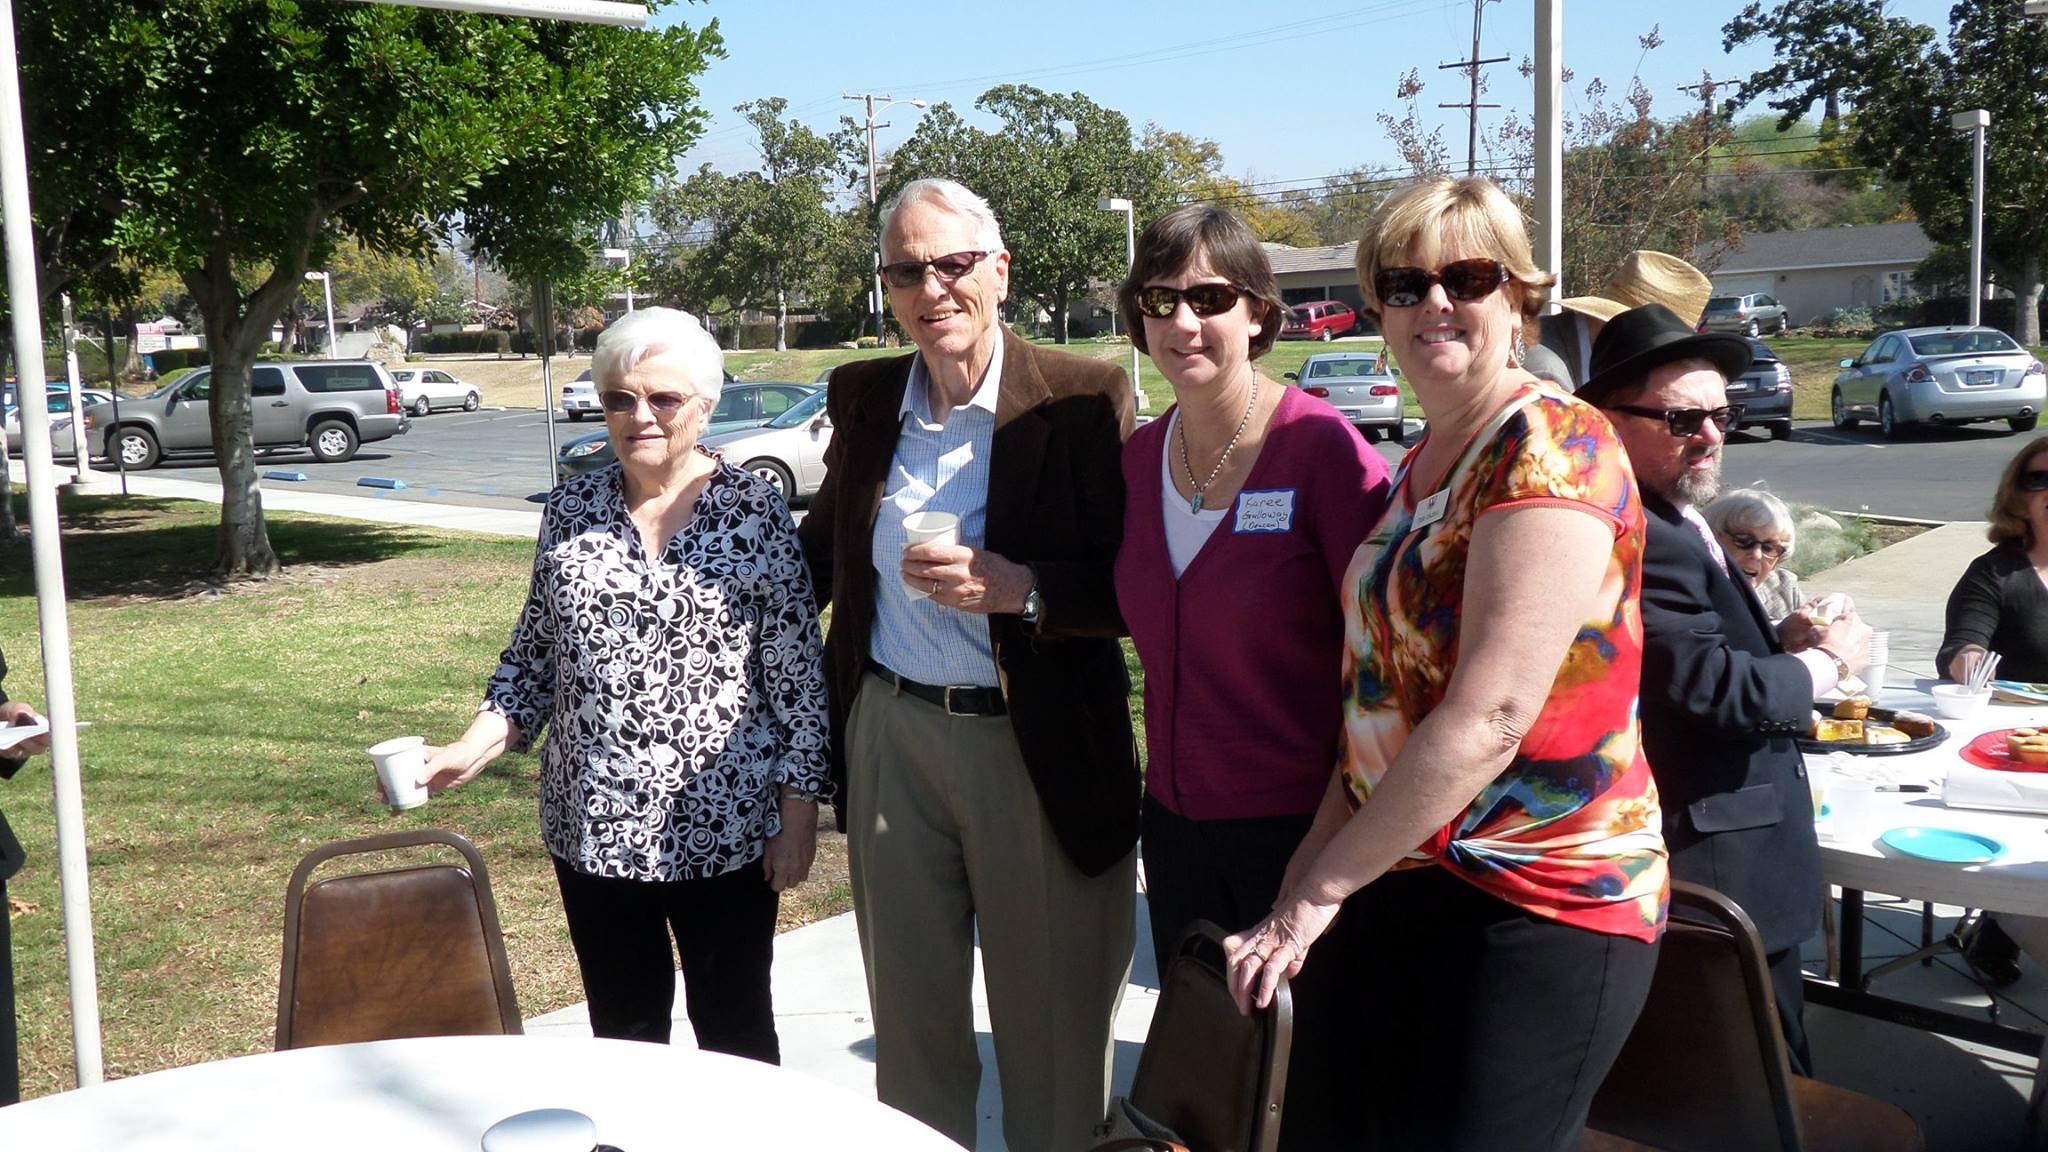 claremont-presbyterian-church-members-gathering.jpg